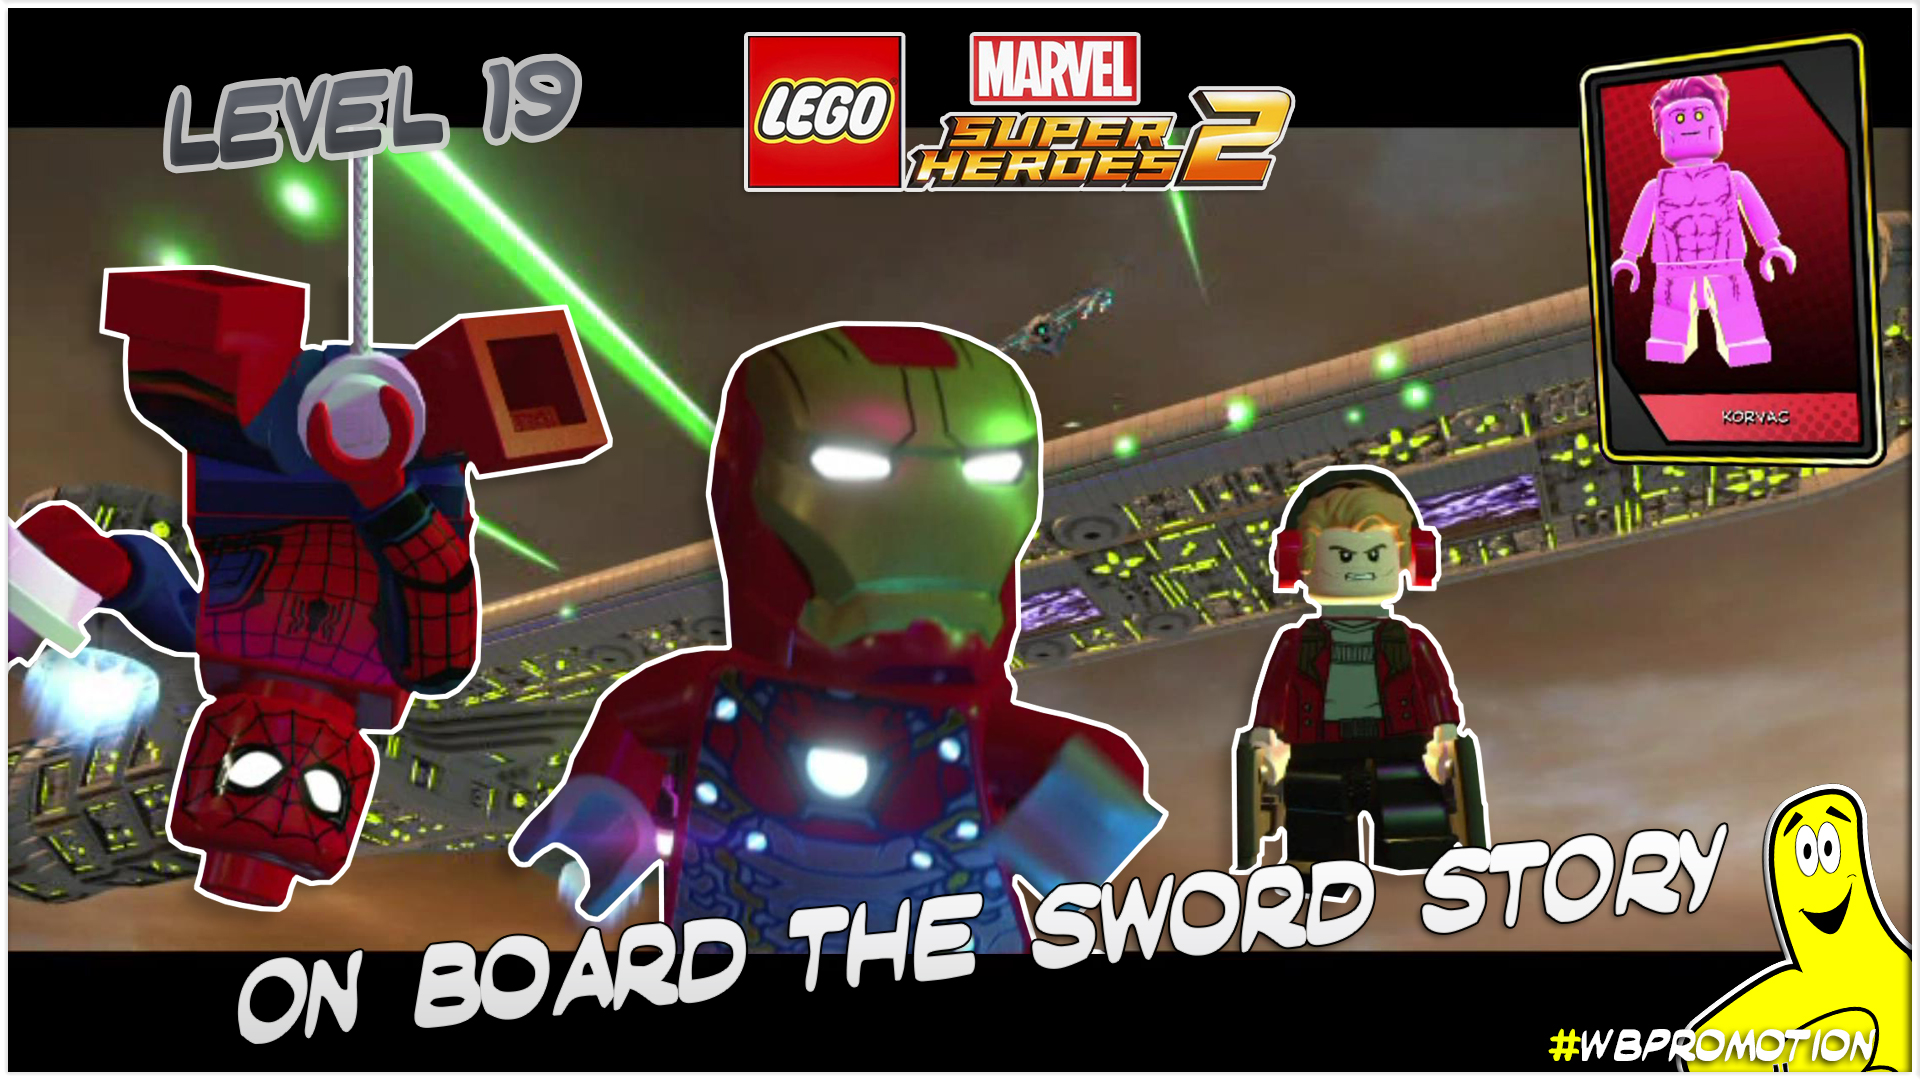 Lego Marvel Superheroes 2: Level 19 / On Board The Sword STORY – HTG